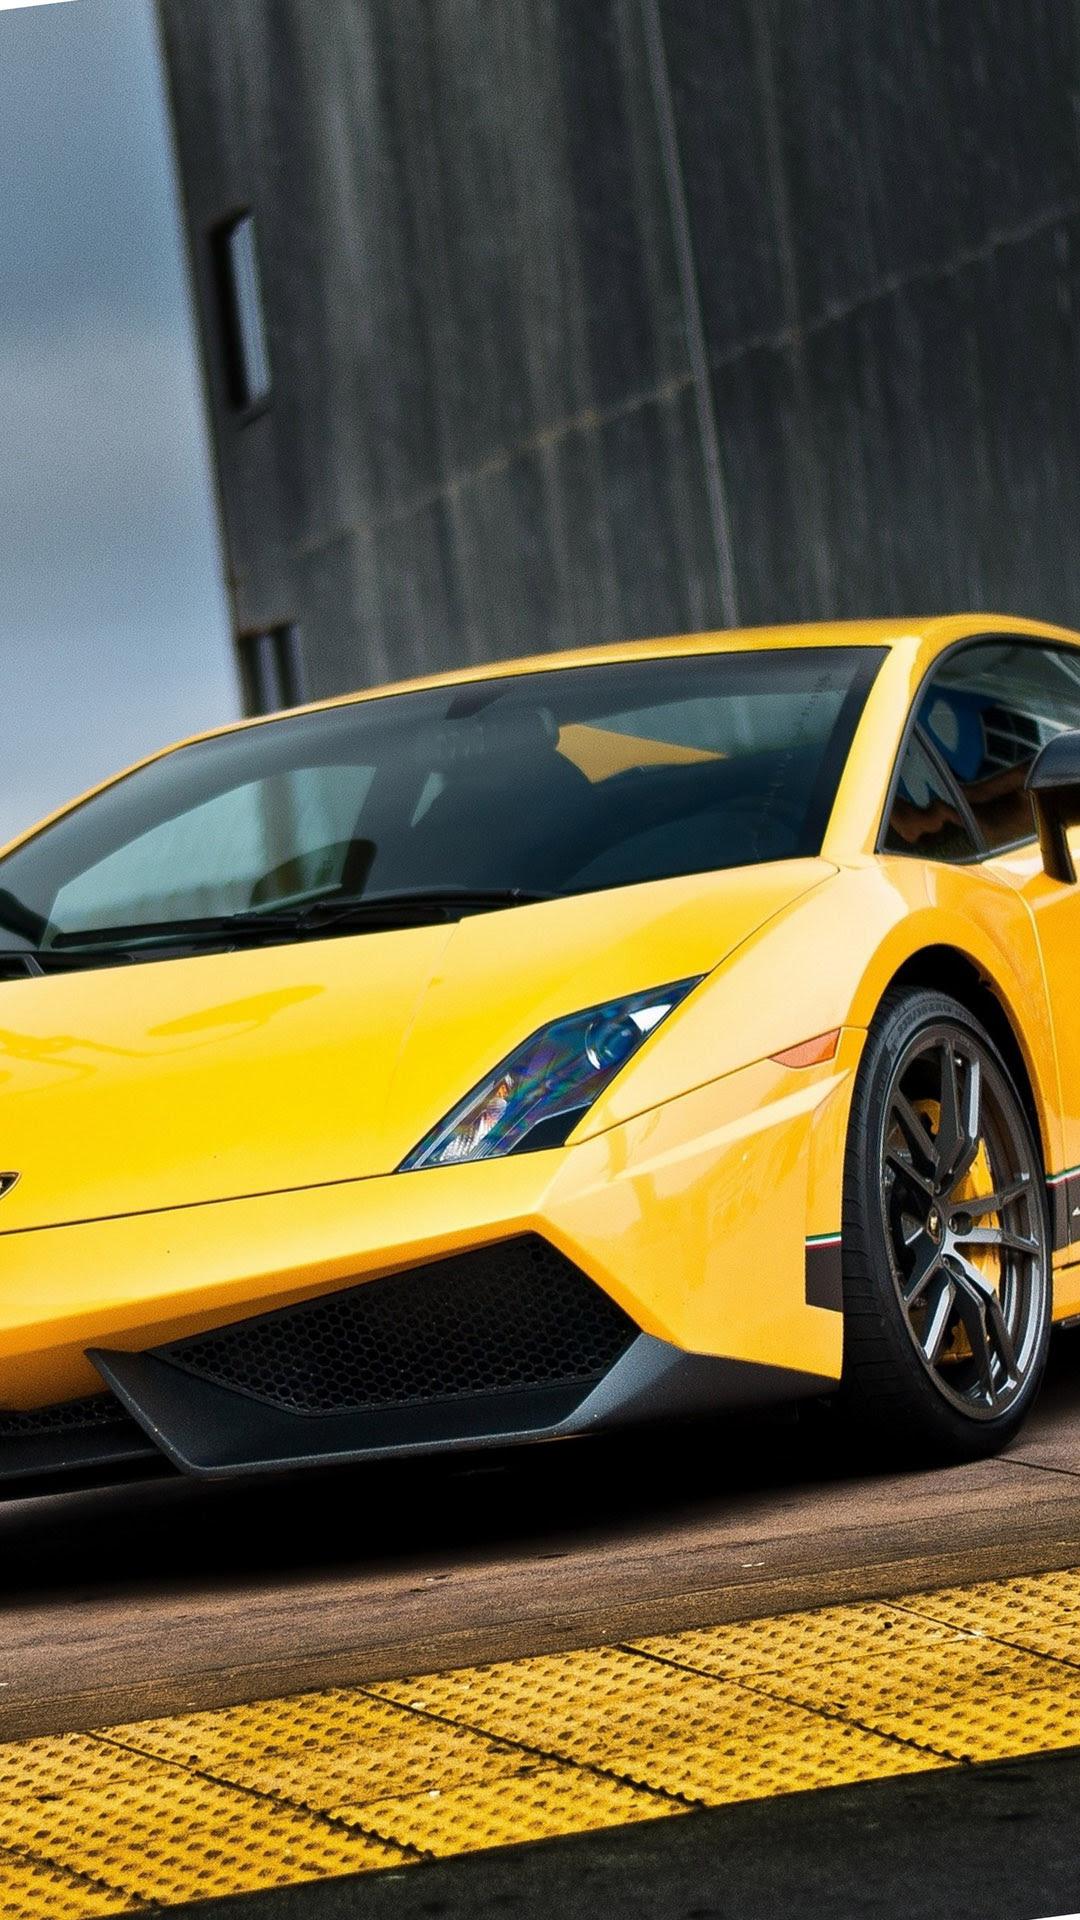 Home Screen Lamborghini Wallpaper Hd For Mobile